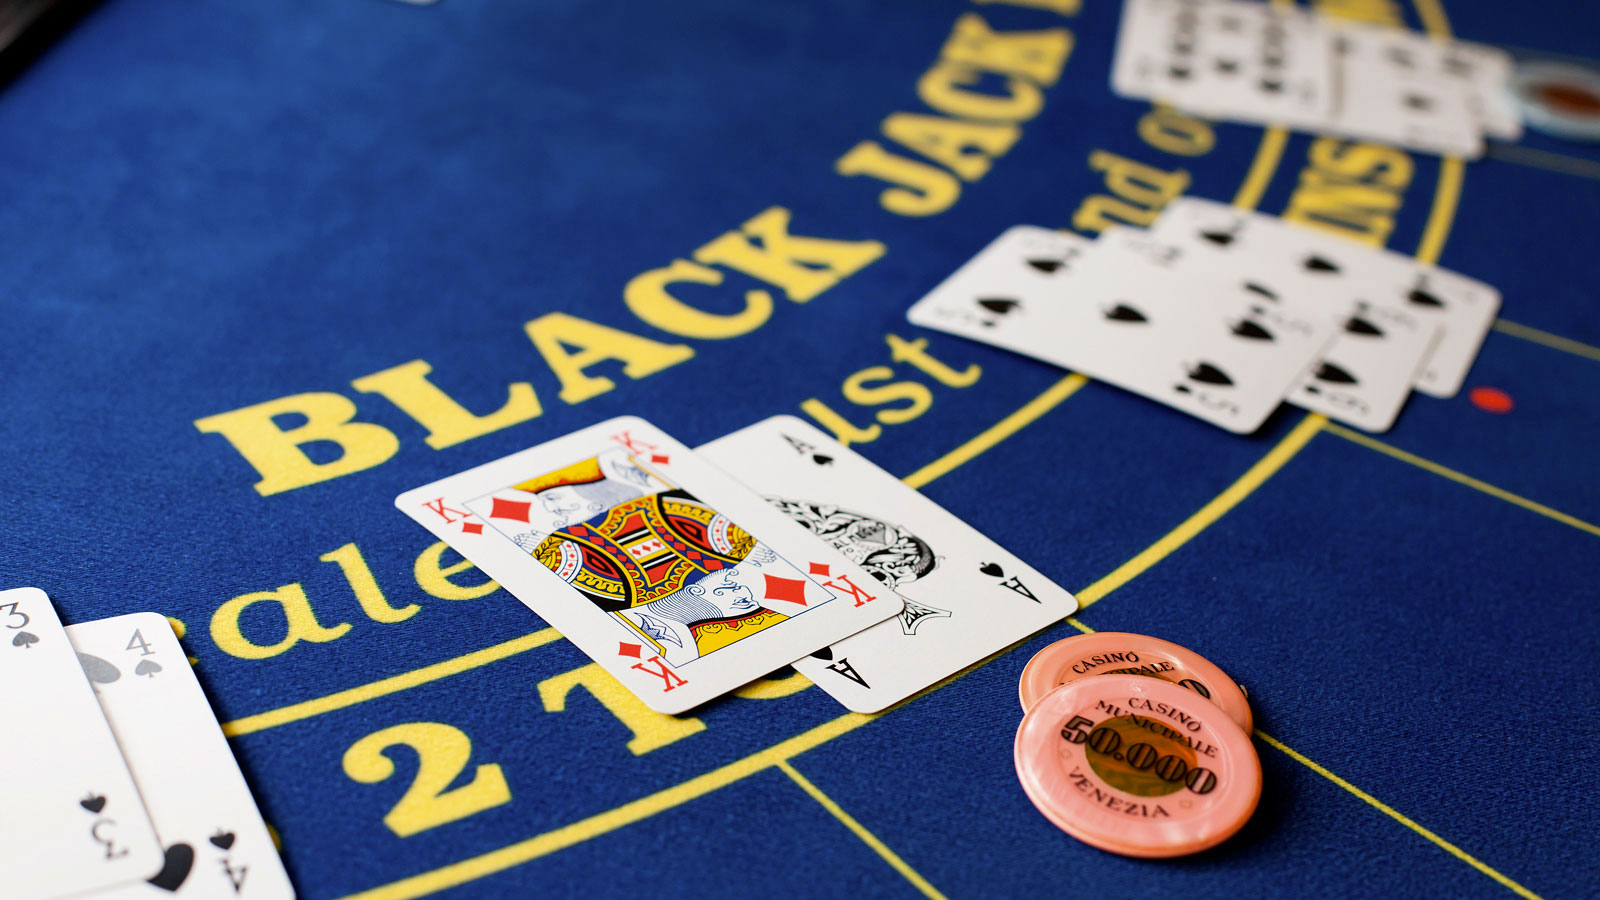 Permainan Judi Blackjack Online Lewat Hp